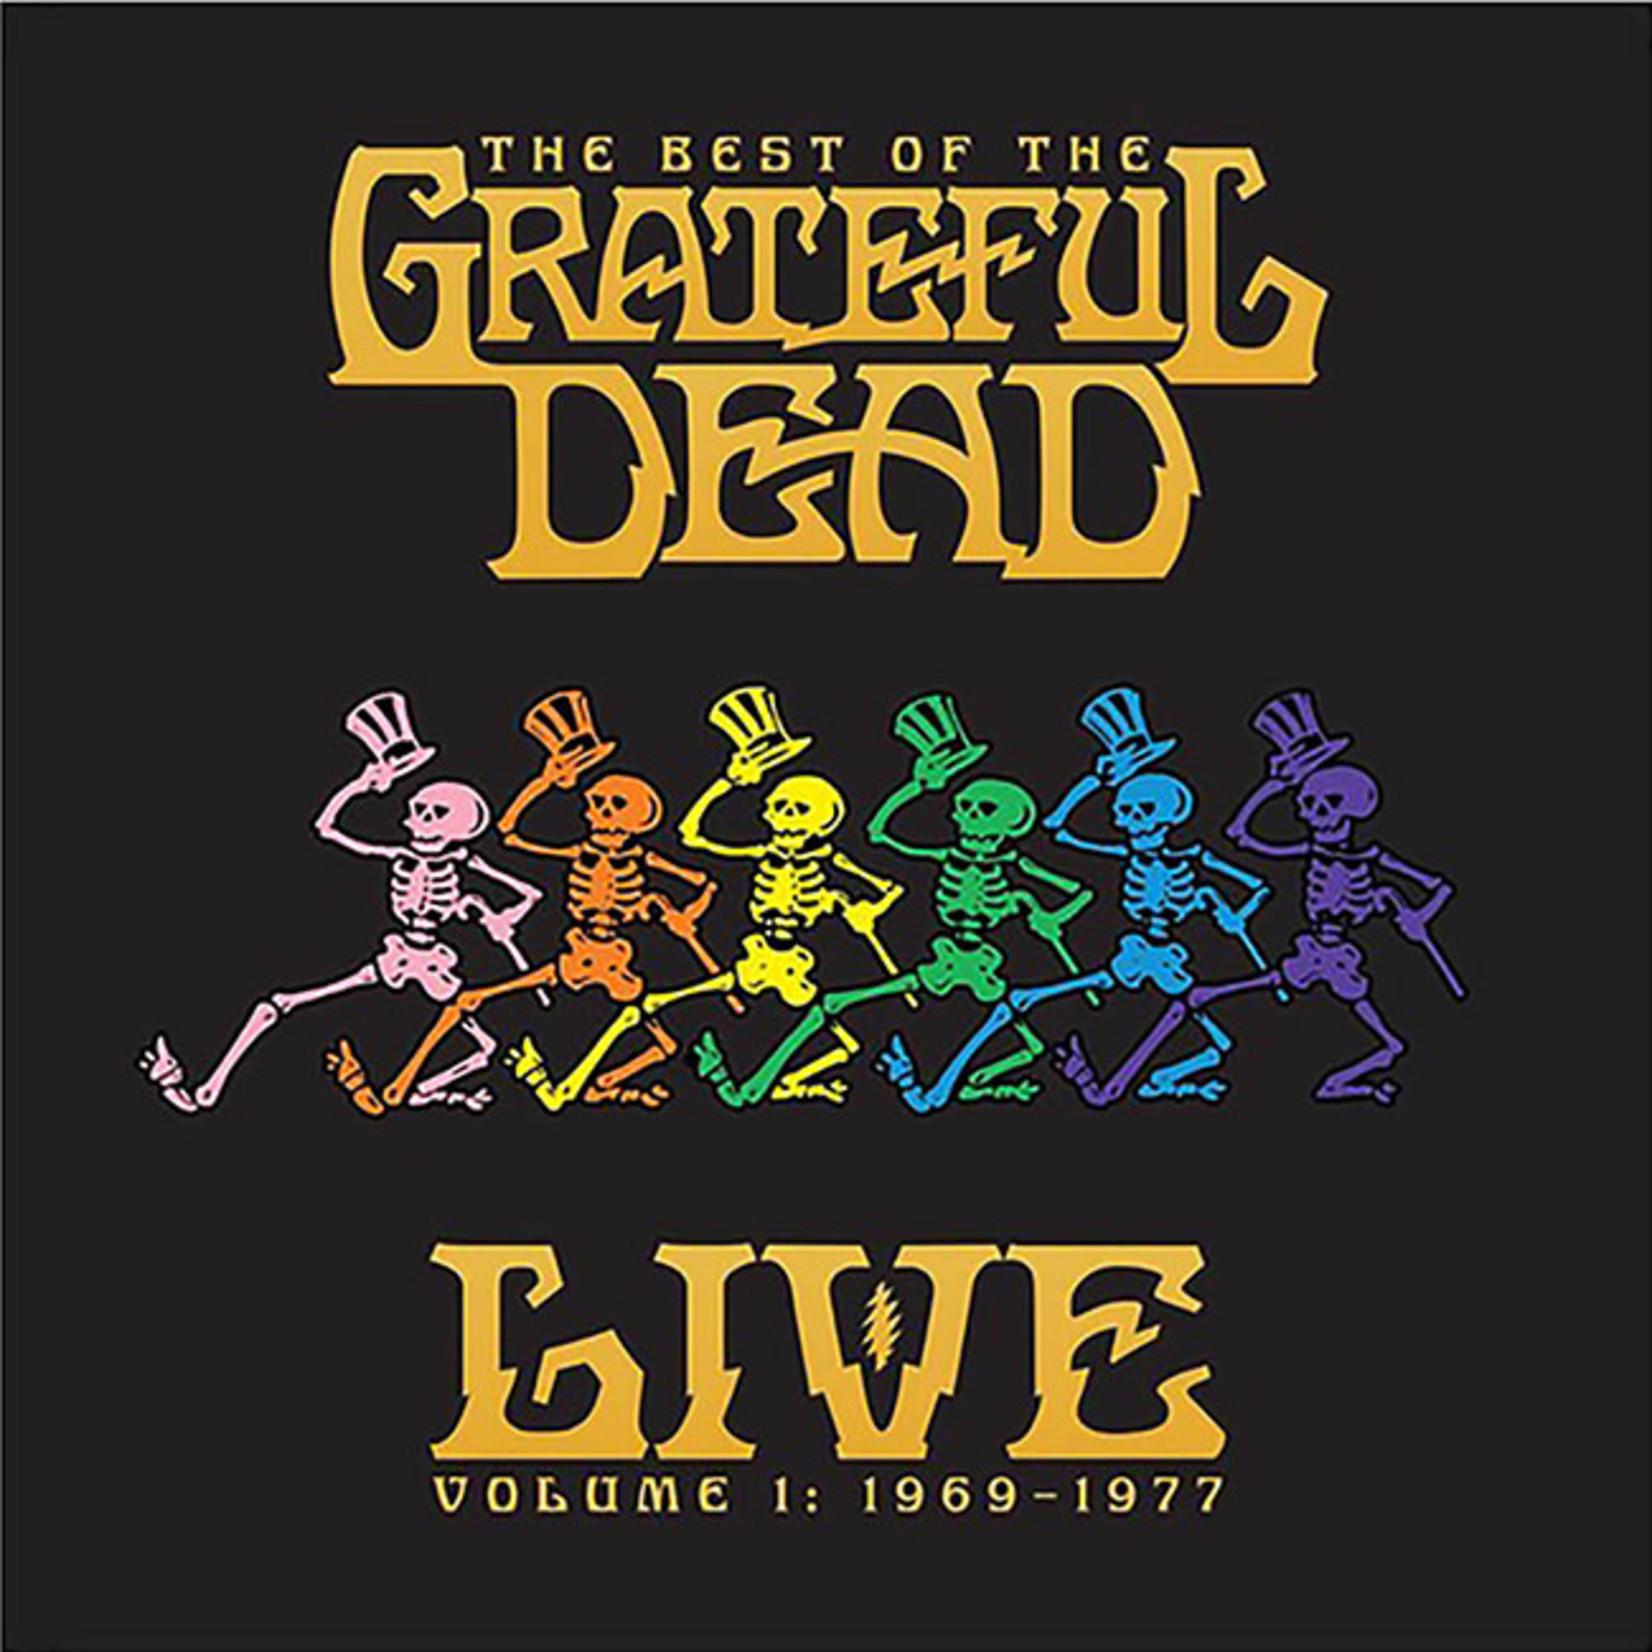 [New] Grateful Dead: The Best Of Vol. 1: 1969-1977 (2LP)